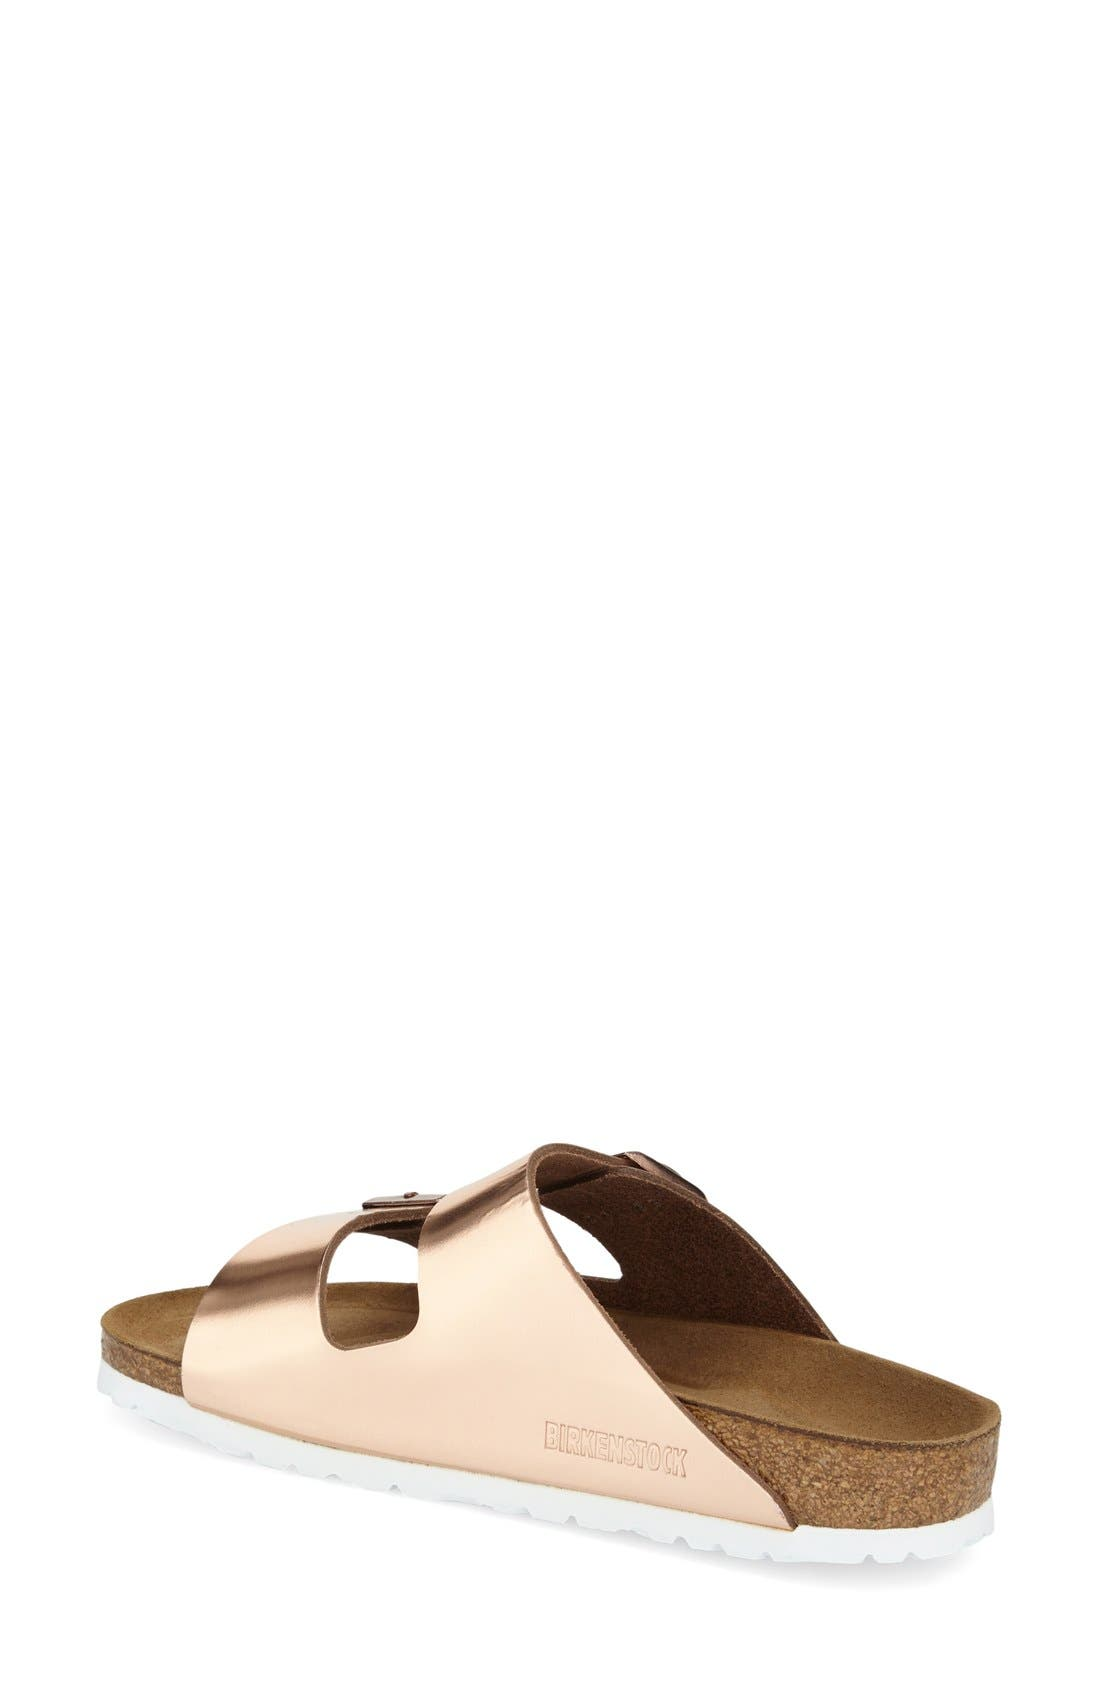 Alternate Image 2  - Birkenstock 'Arizona' Patent Leather Sandal (Women)